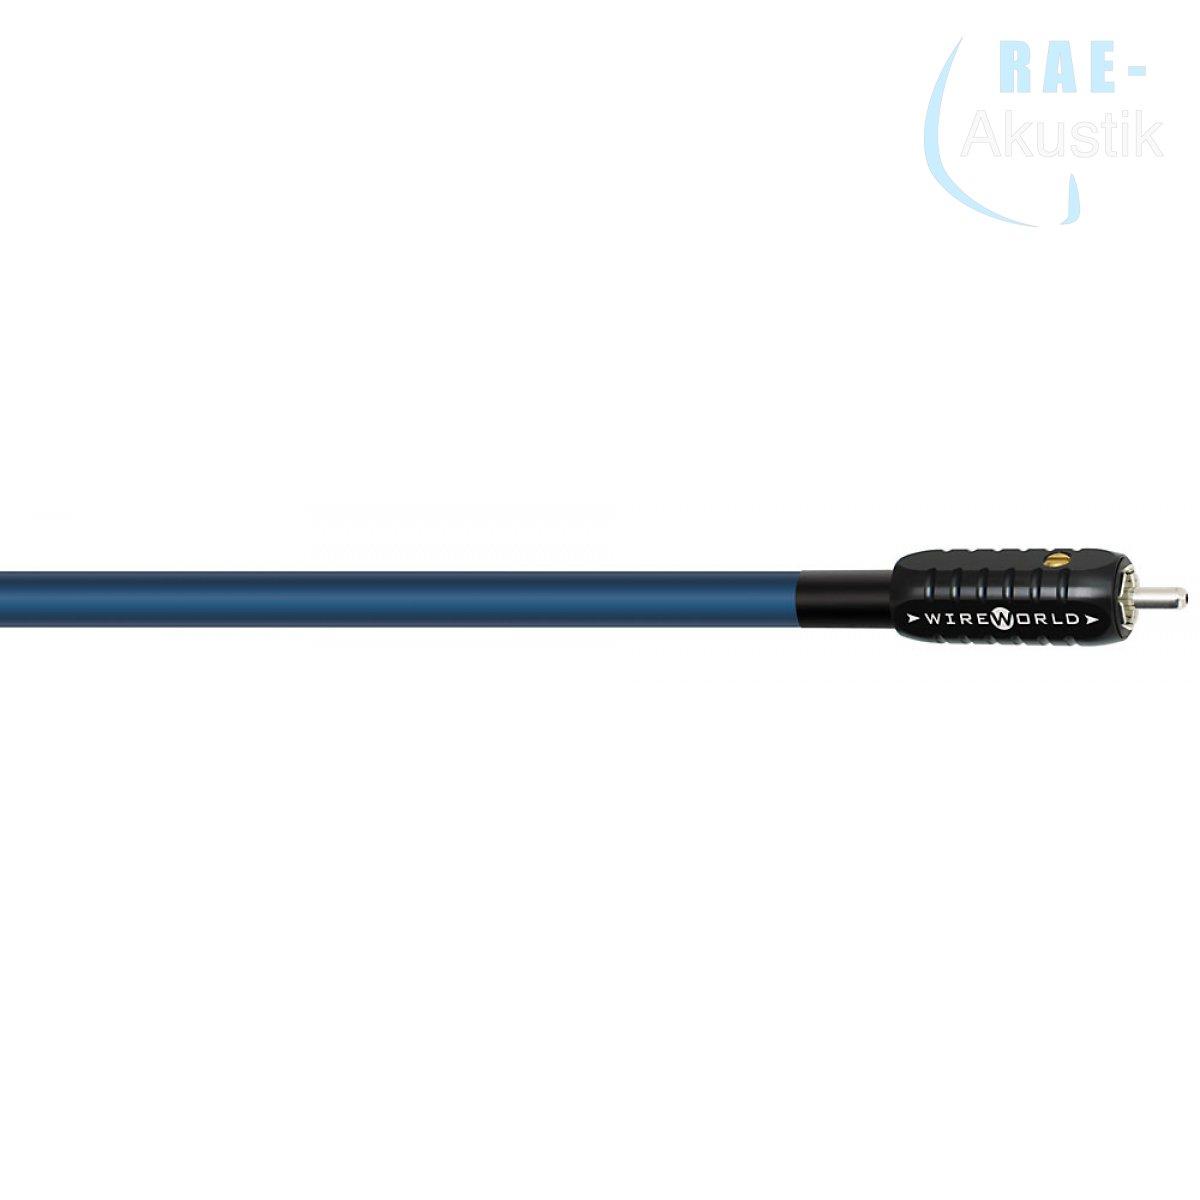 WIREWORLD® Oasis 7 NF Kabel, OFC Leiter, 99,00 €